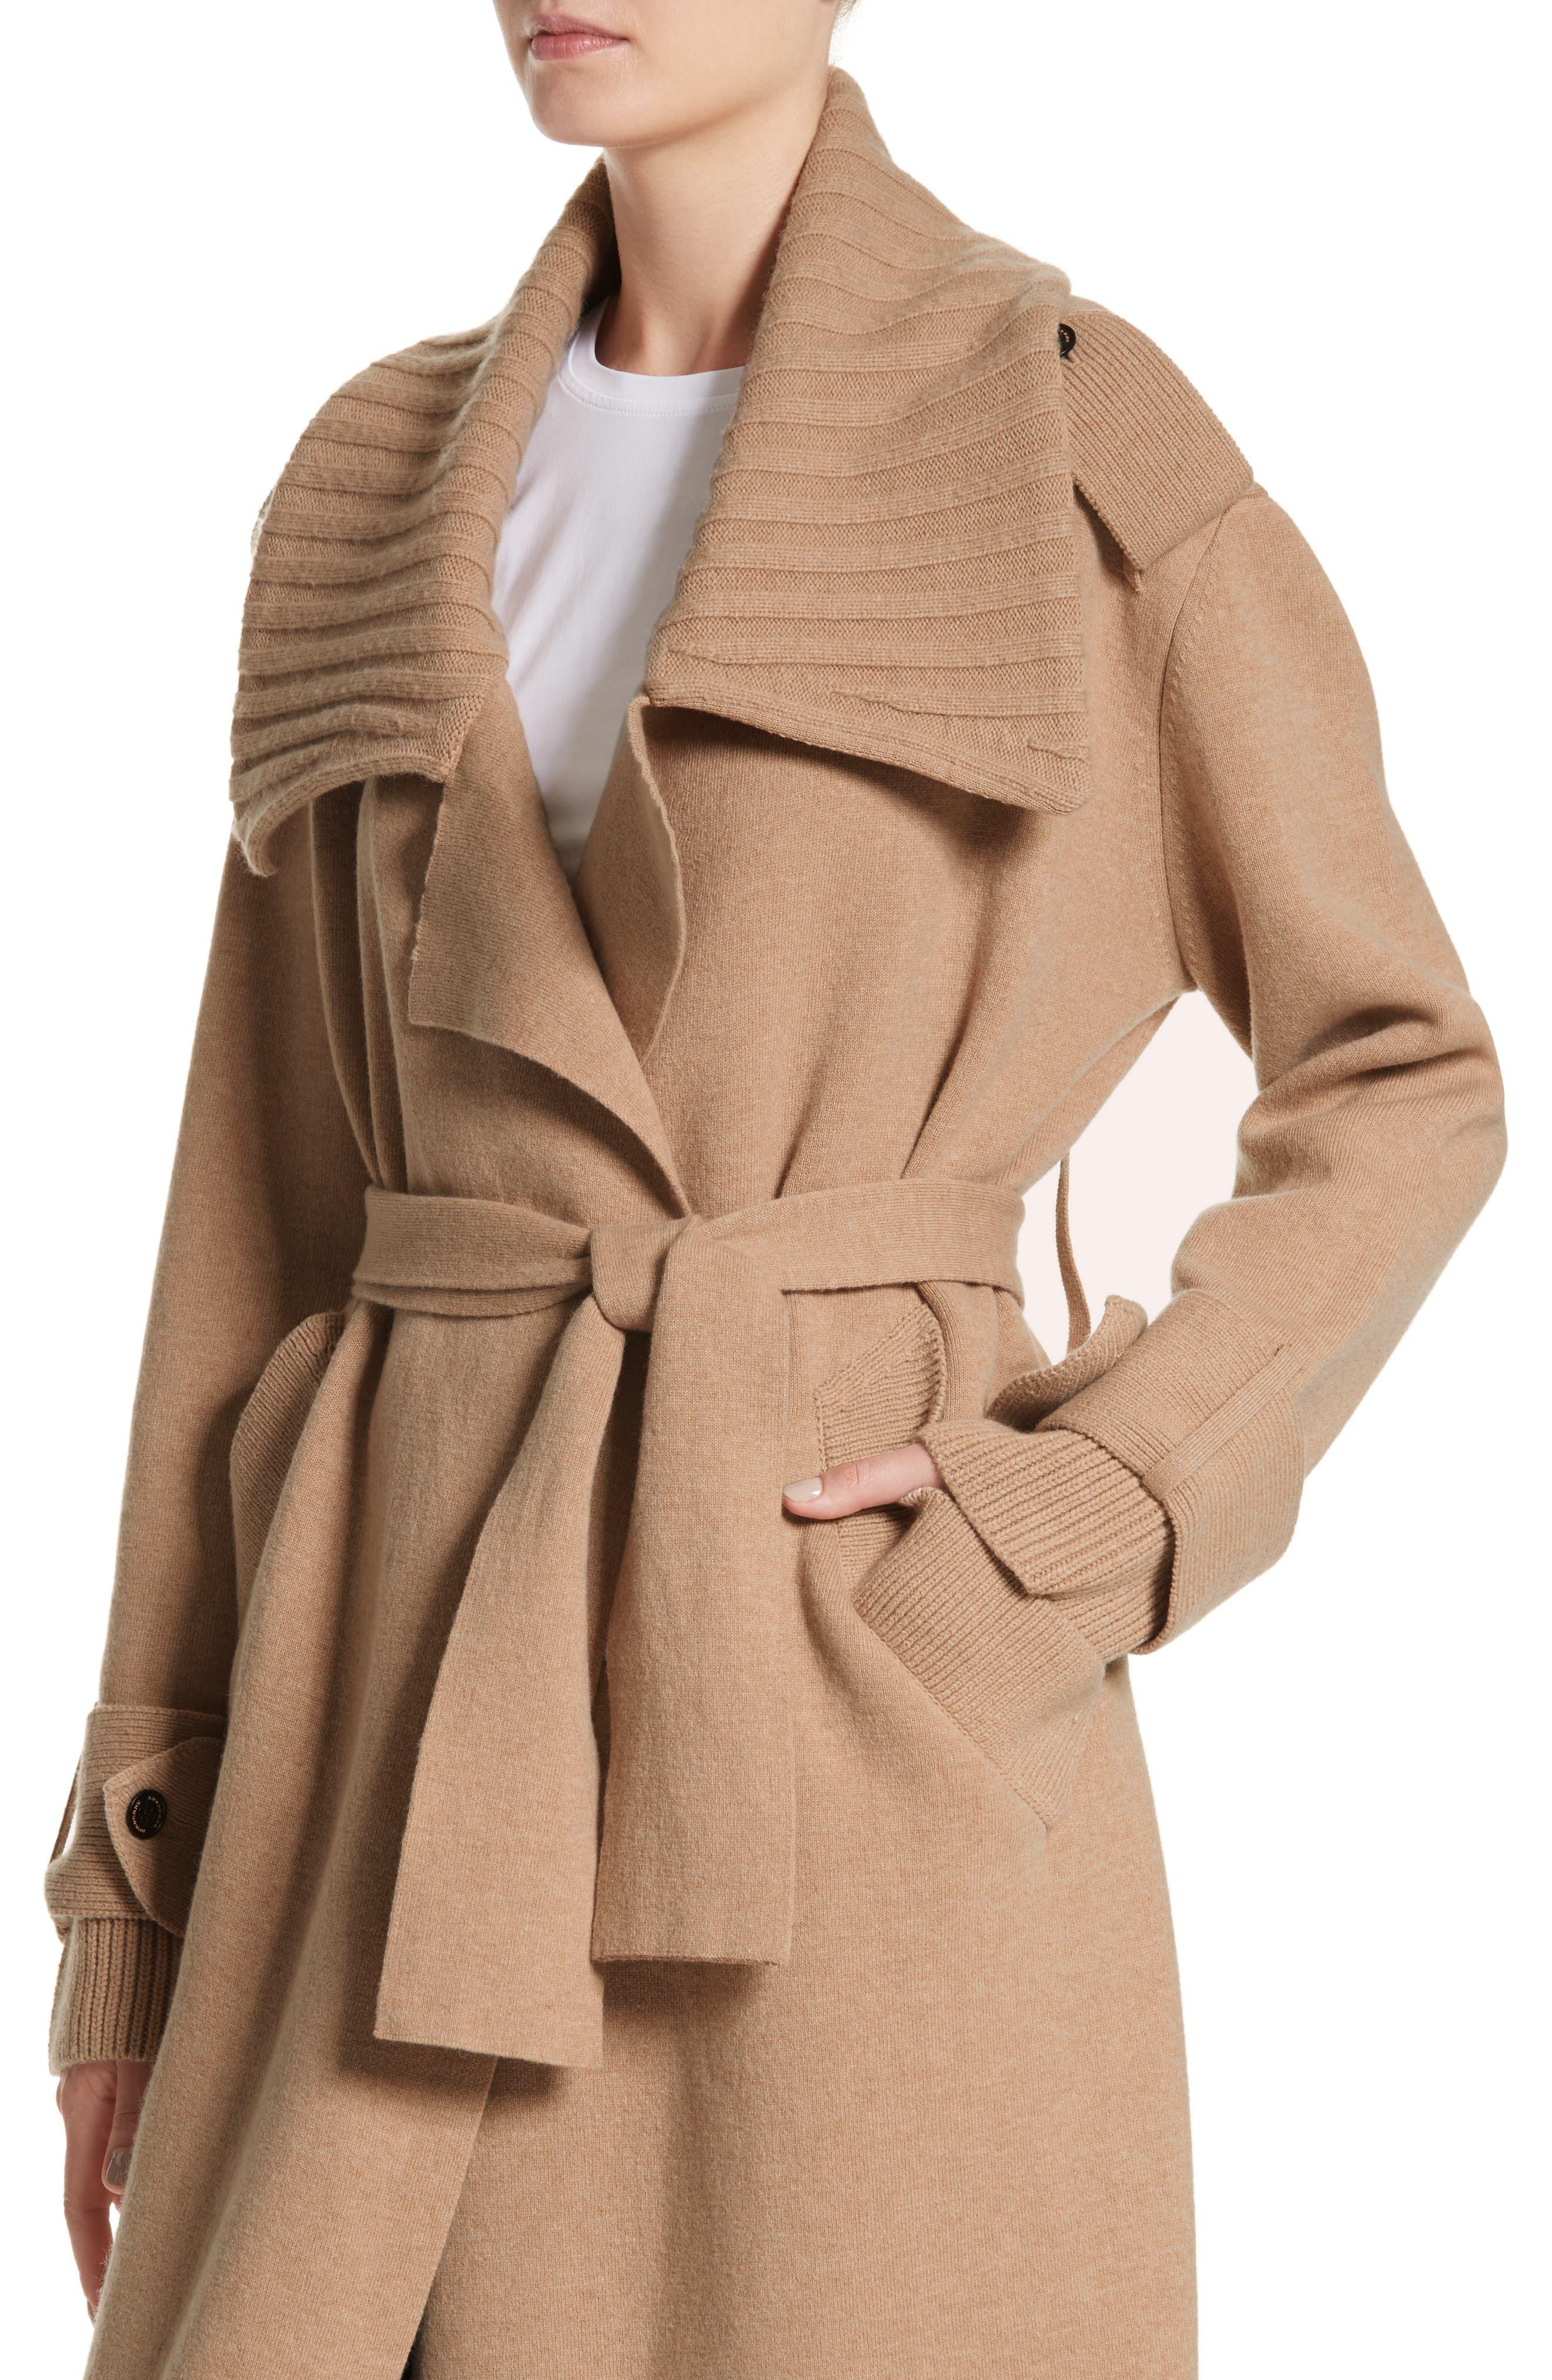 Piota Wool Blend Knit Trench Coat,                             Alternate thumbnail 4, color,                             231